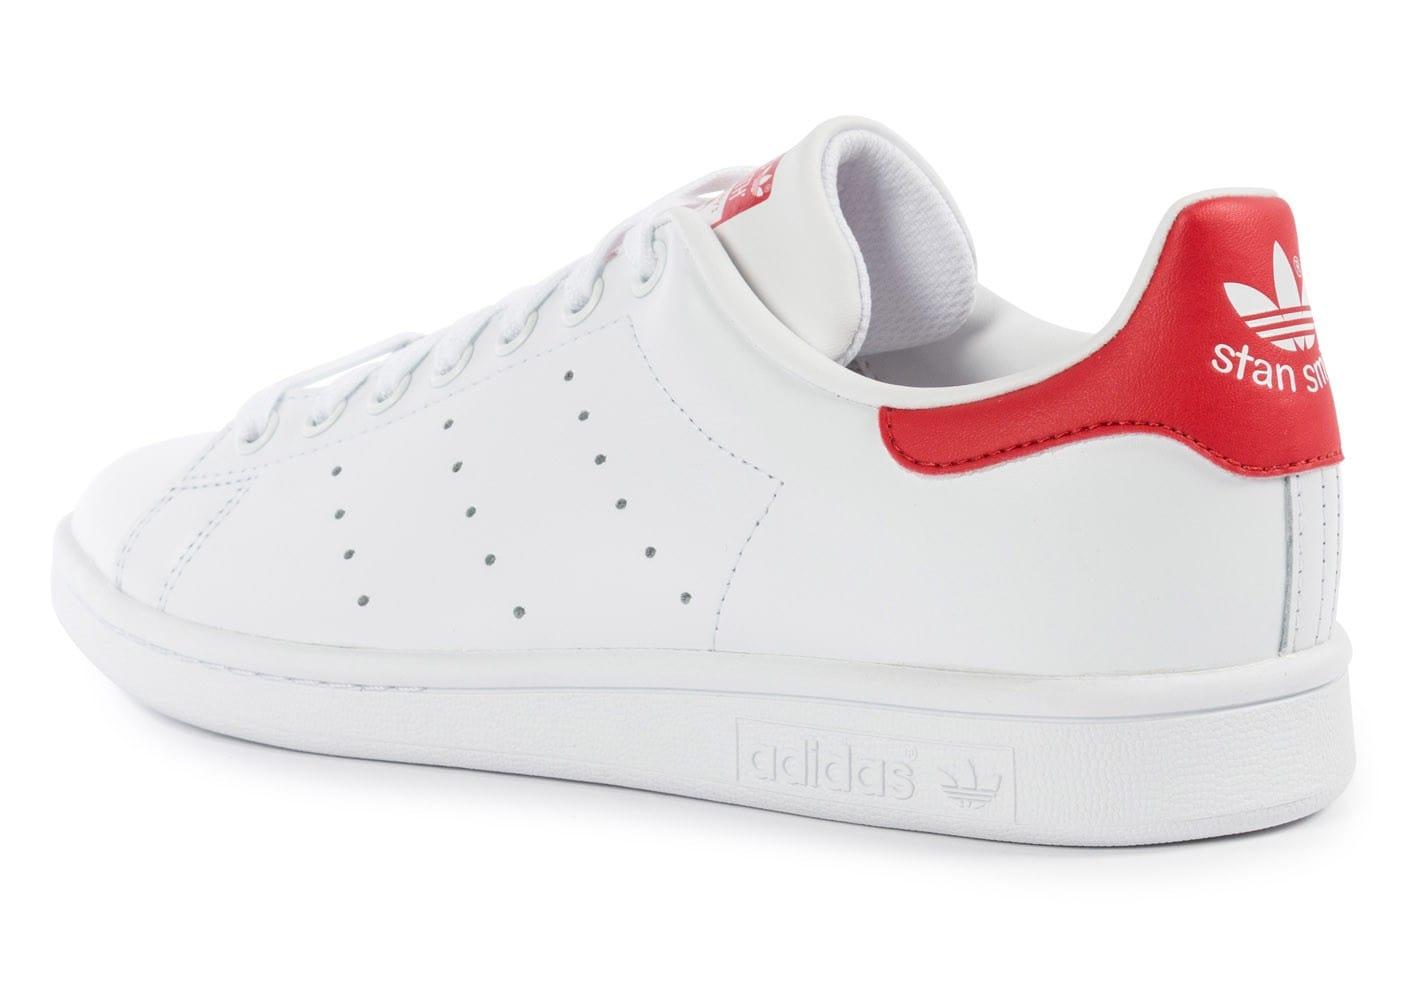 adidas stan smith blanc et rouge